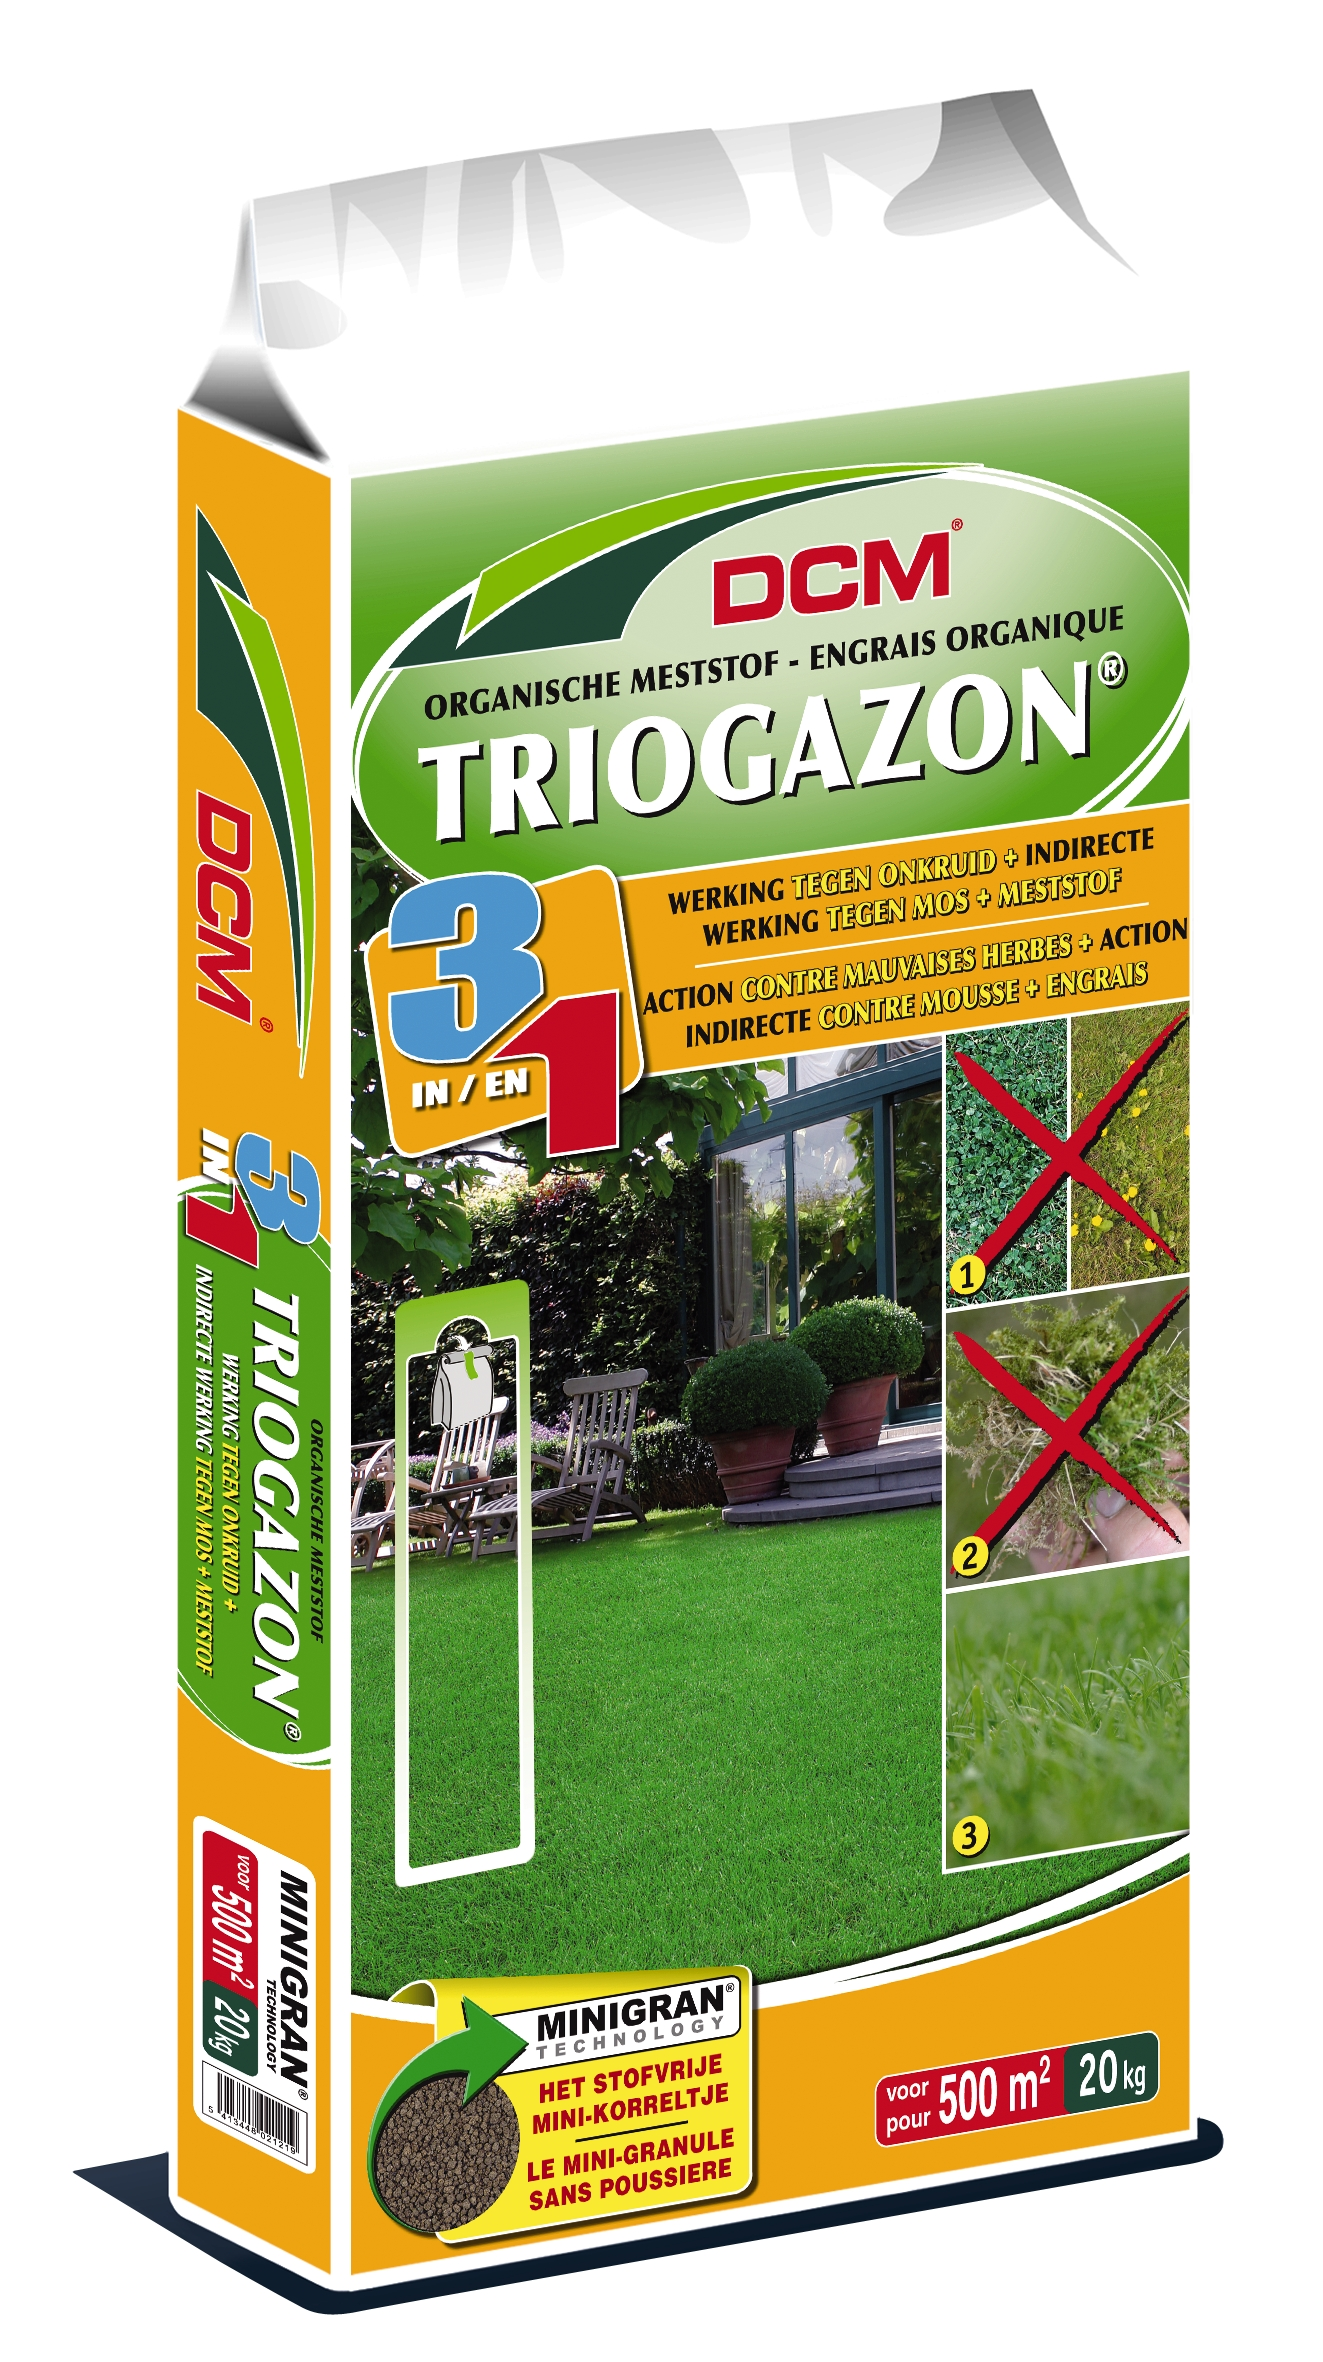 Dcm Gazonmeststof Triogazon